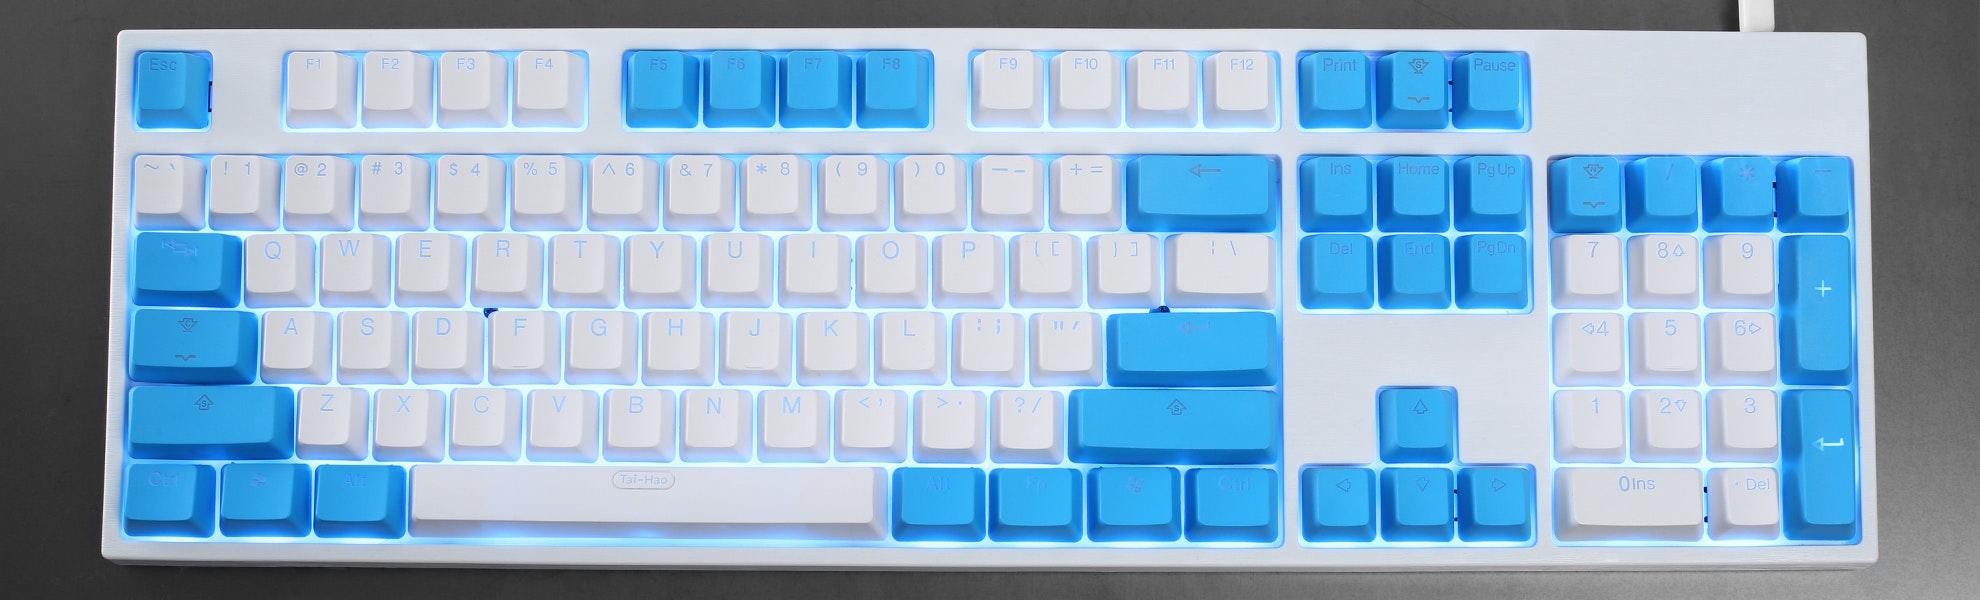 Tai-Hao Doubleshot PBT Shine-Through 108-Keycap Set